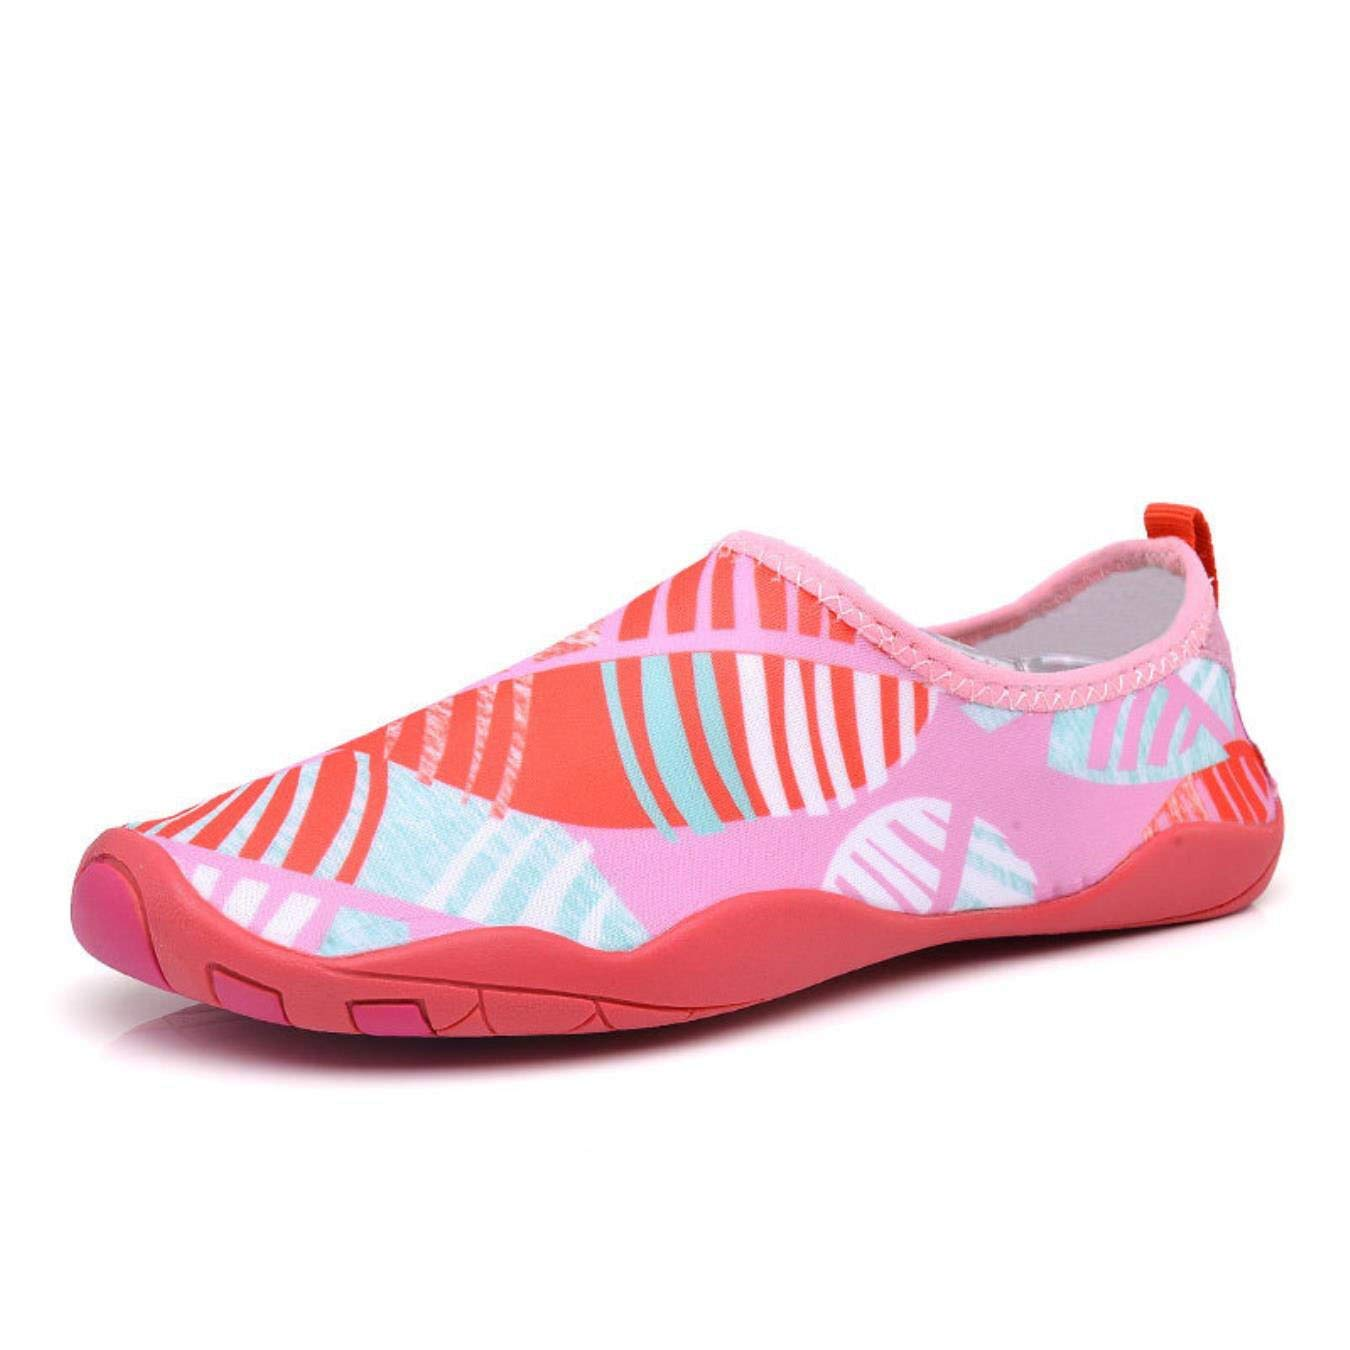 Outdoor Beach Summer Outdoor Shoes Woman Men Shoes Trekking Senderismo Upstream Walking Water Quick Drying Sneaker Shoes